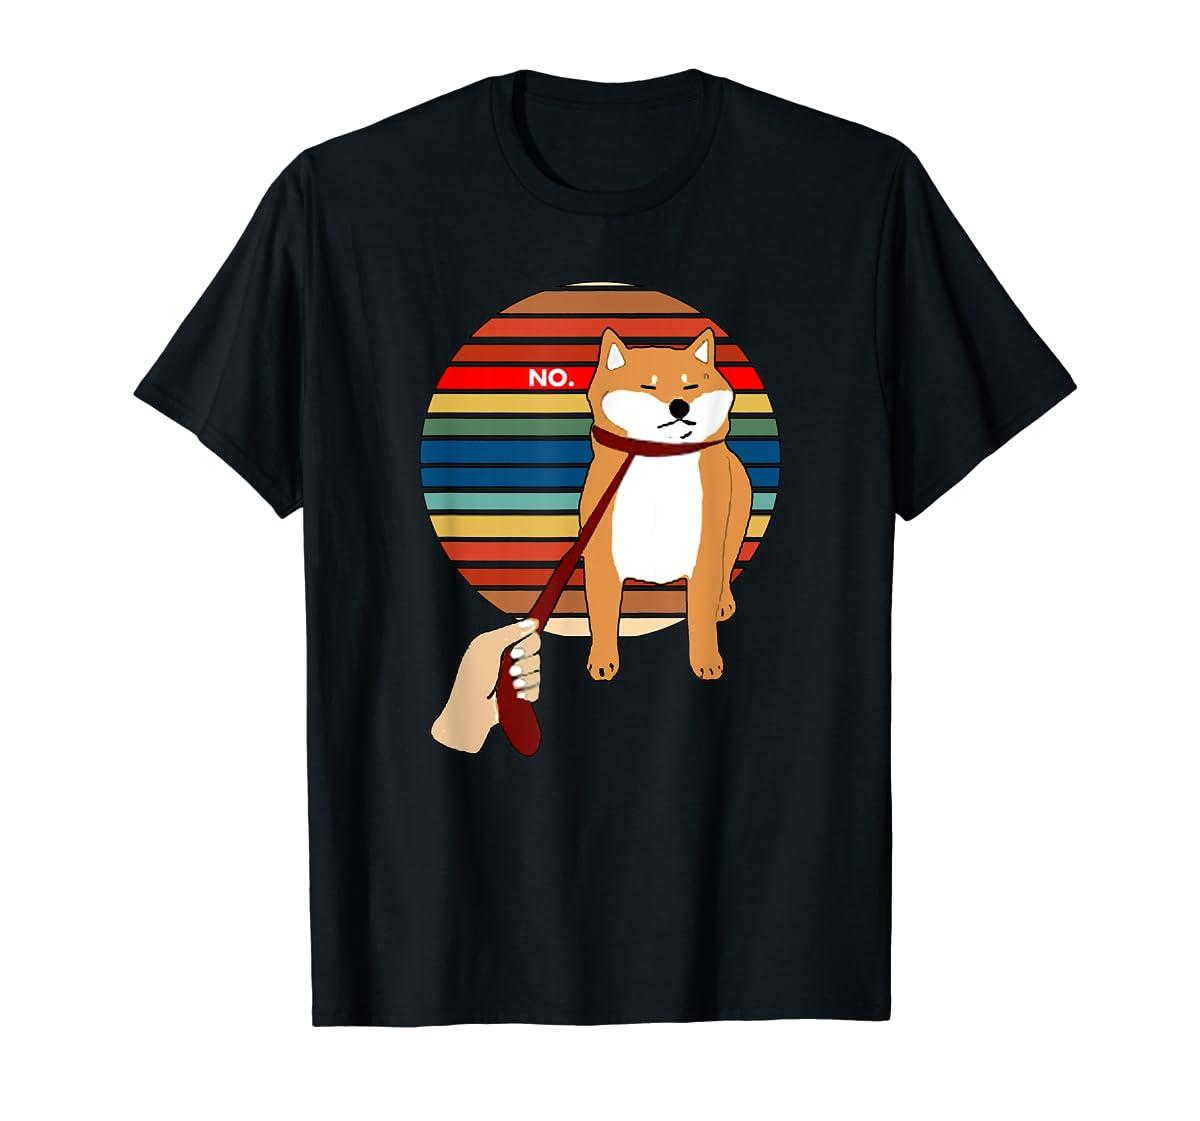 Cute Vintage Retro Shiba Inu Nope Dog Tee Shirt-Men's T-Shirt-Black